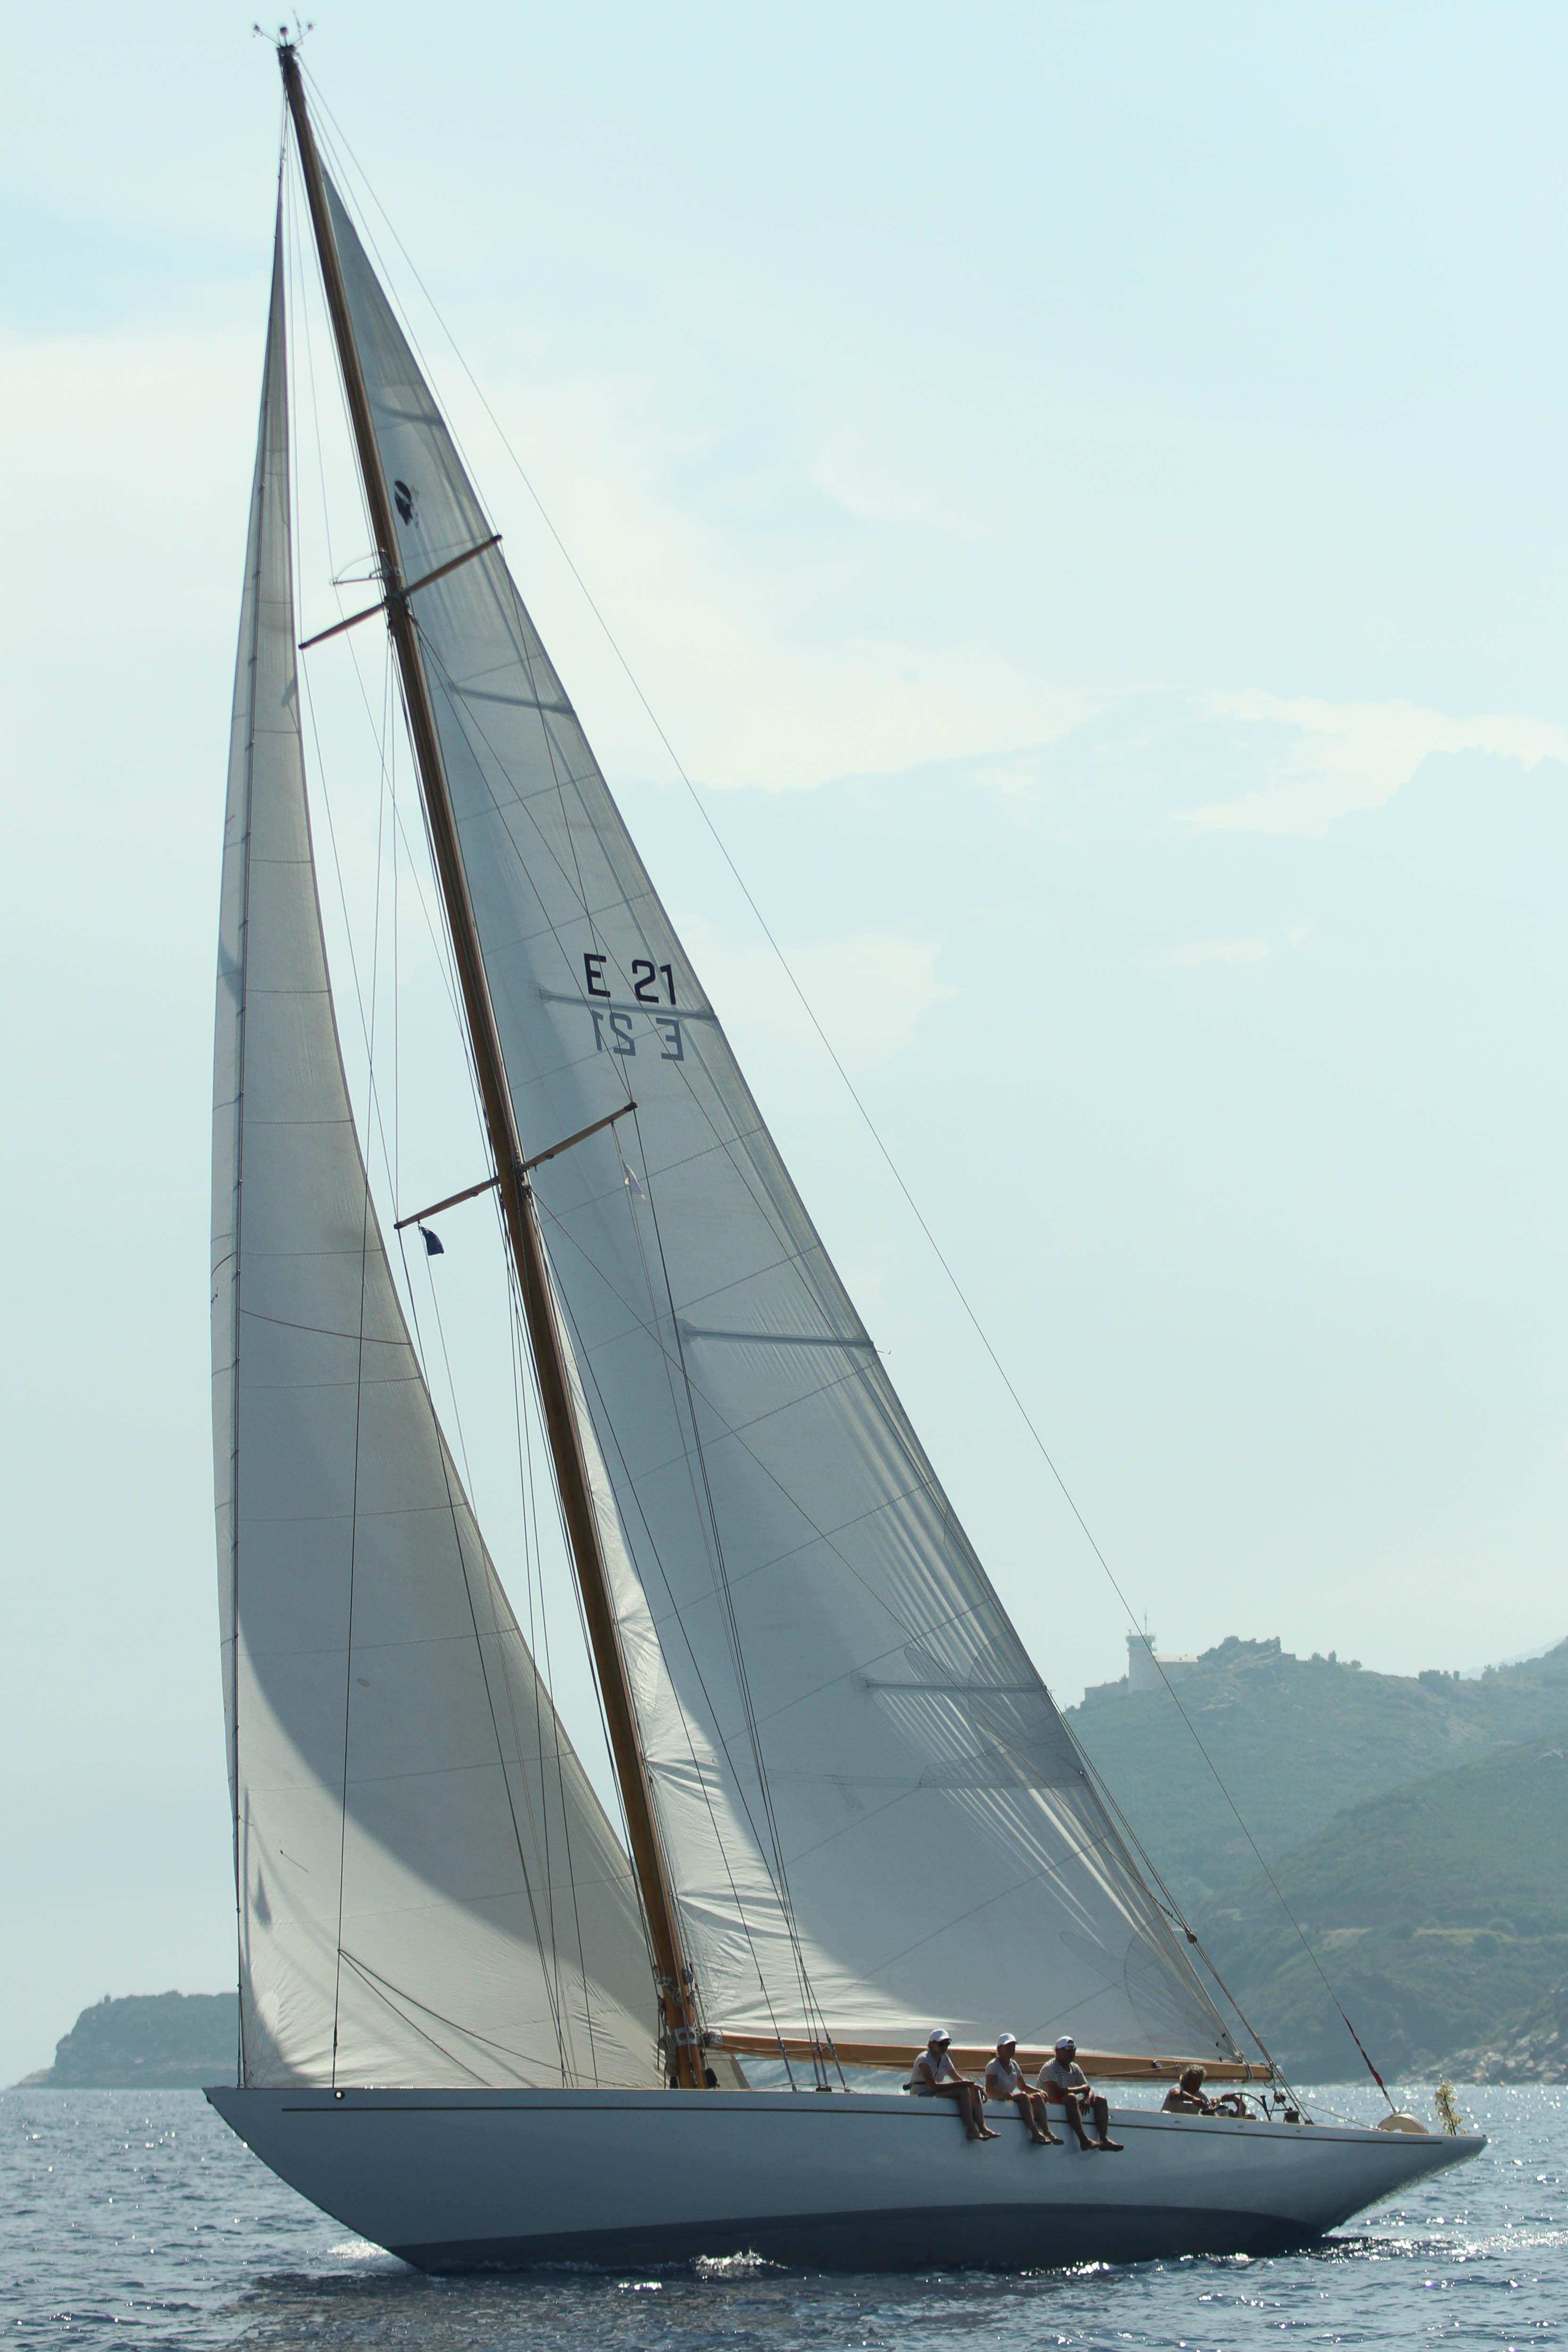 CC 2019 SY Eileen 1938 Bastia Vieux Port - Macinaggio vendredi 30 août photo Olivier Mariotti DR